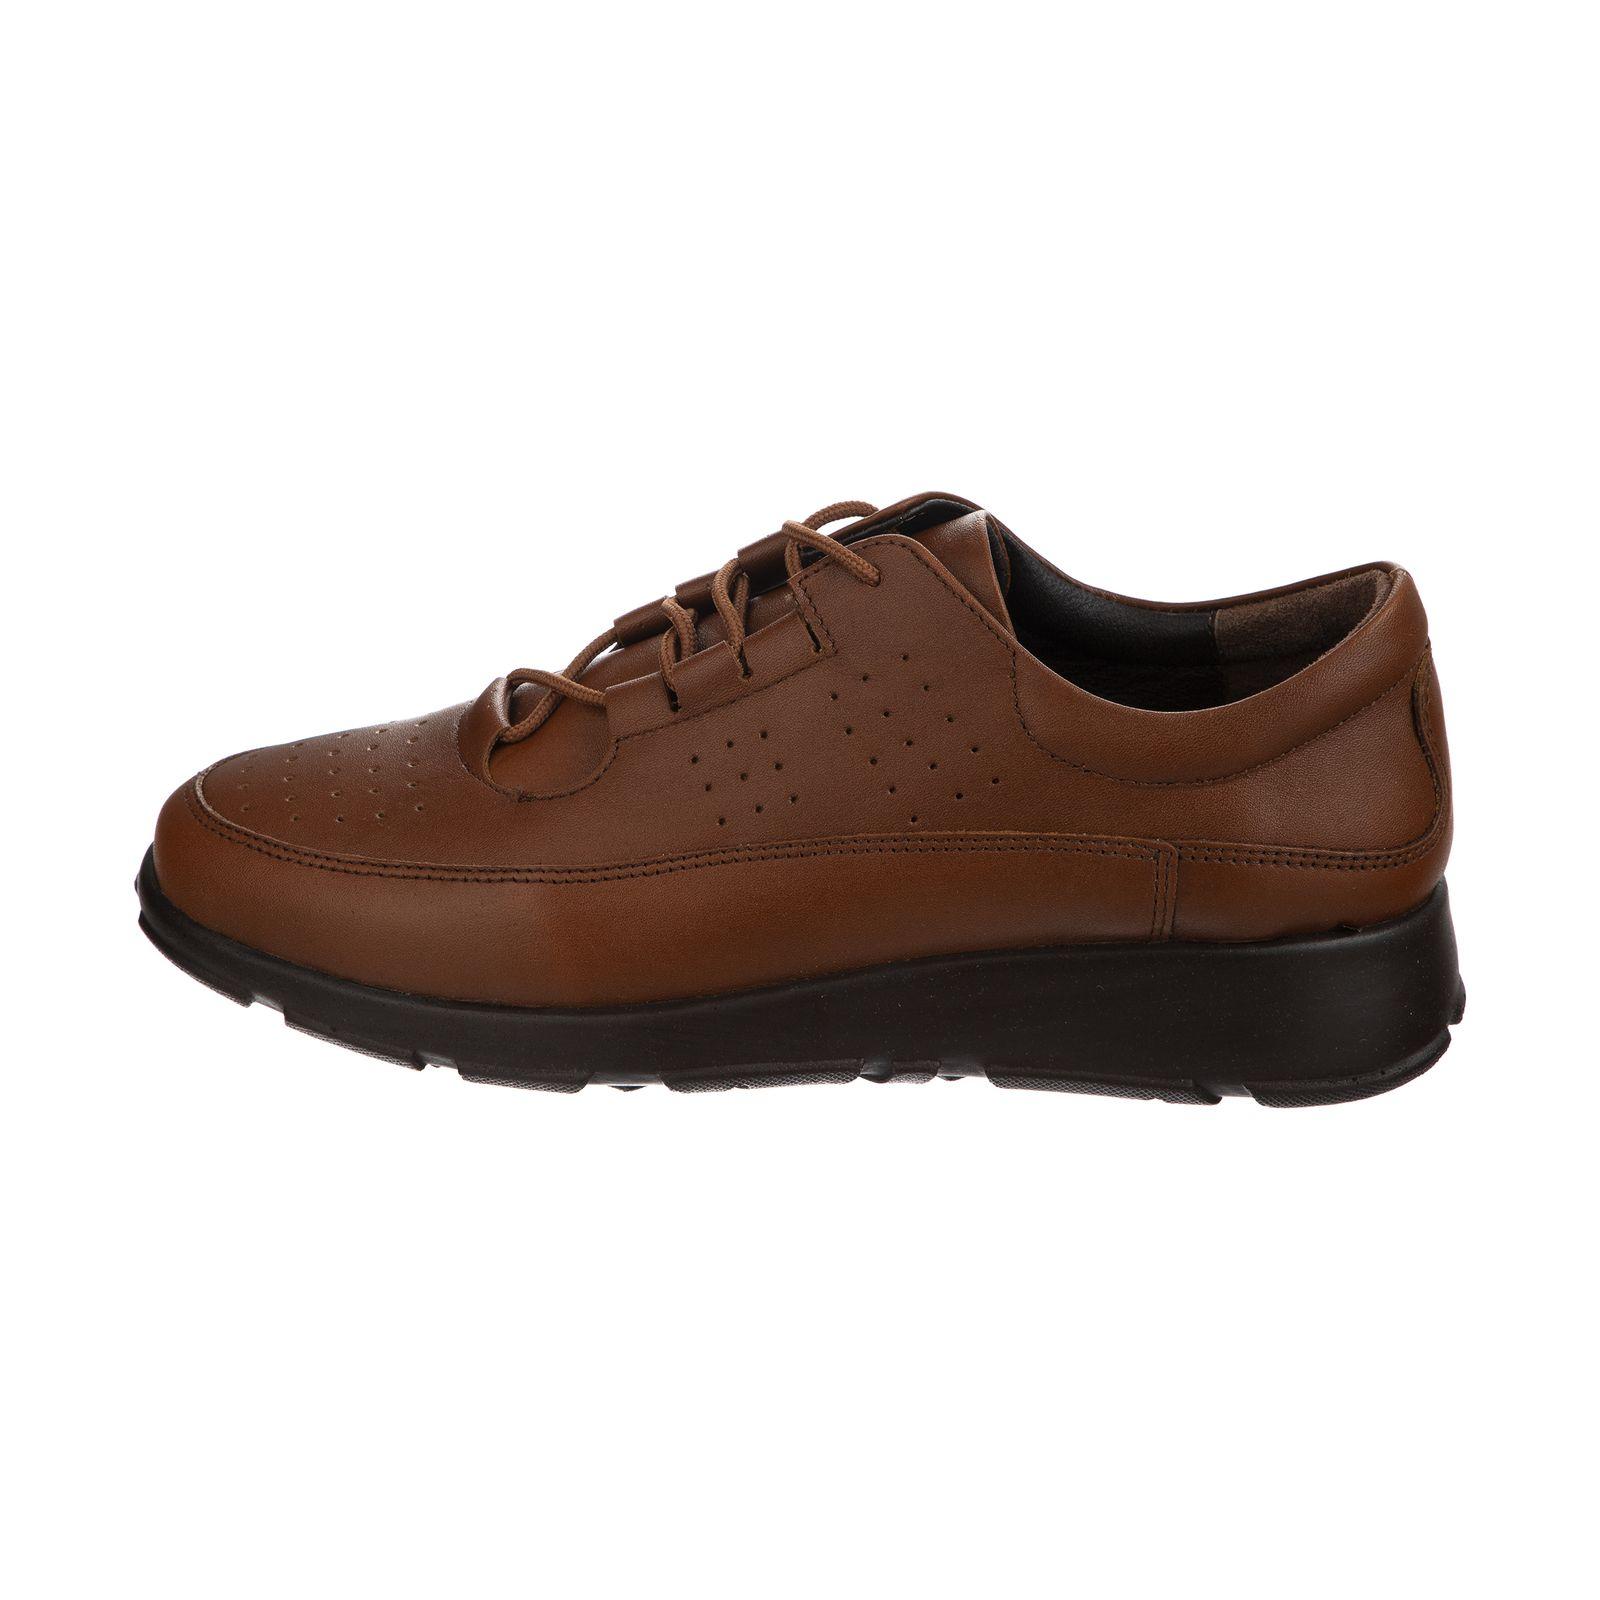 کفش روزمره زنانه شیفر مدل 5289A500136 -  - 2